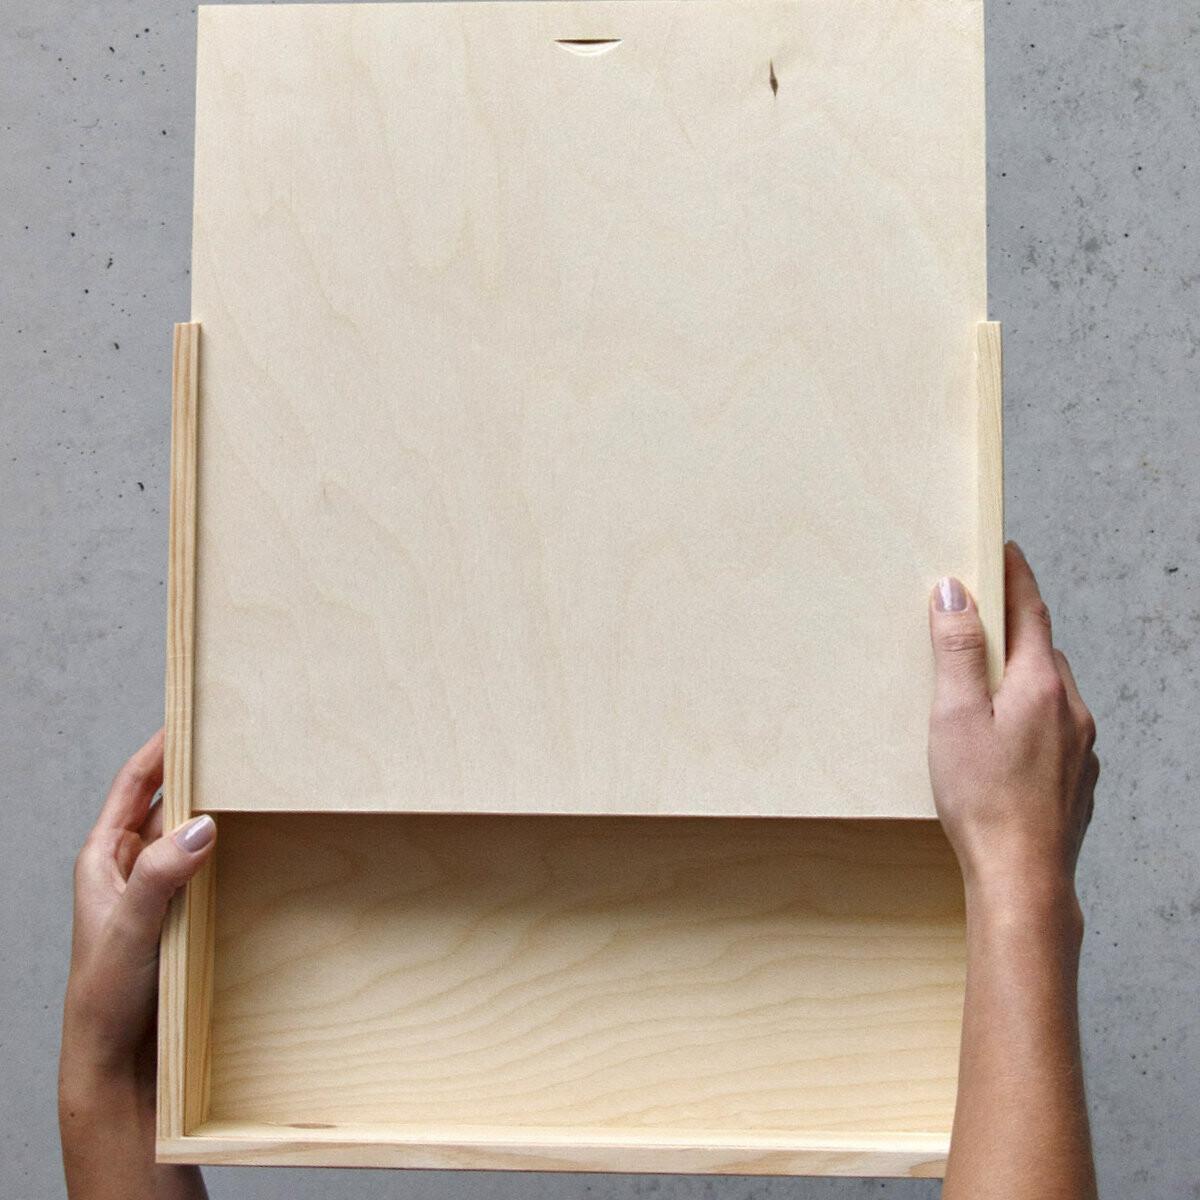 kiste holz beautiful holzkiste holztruhe truhe kiste holz. Black Bedroom Furniture Sets. Home Design Ideas